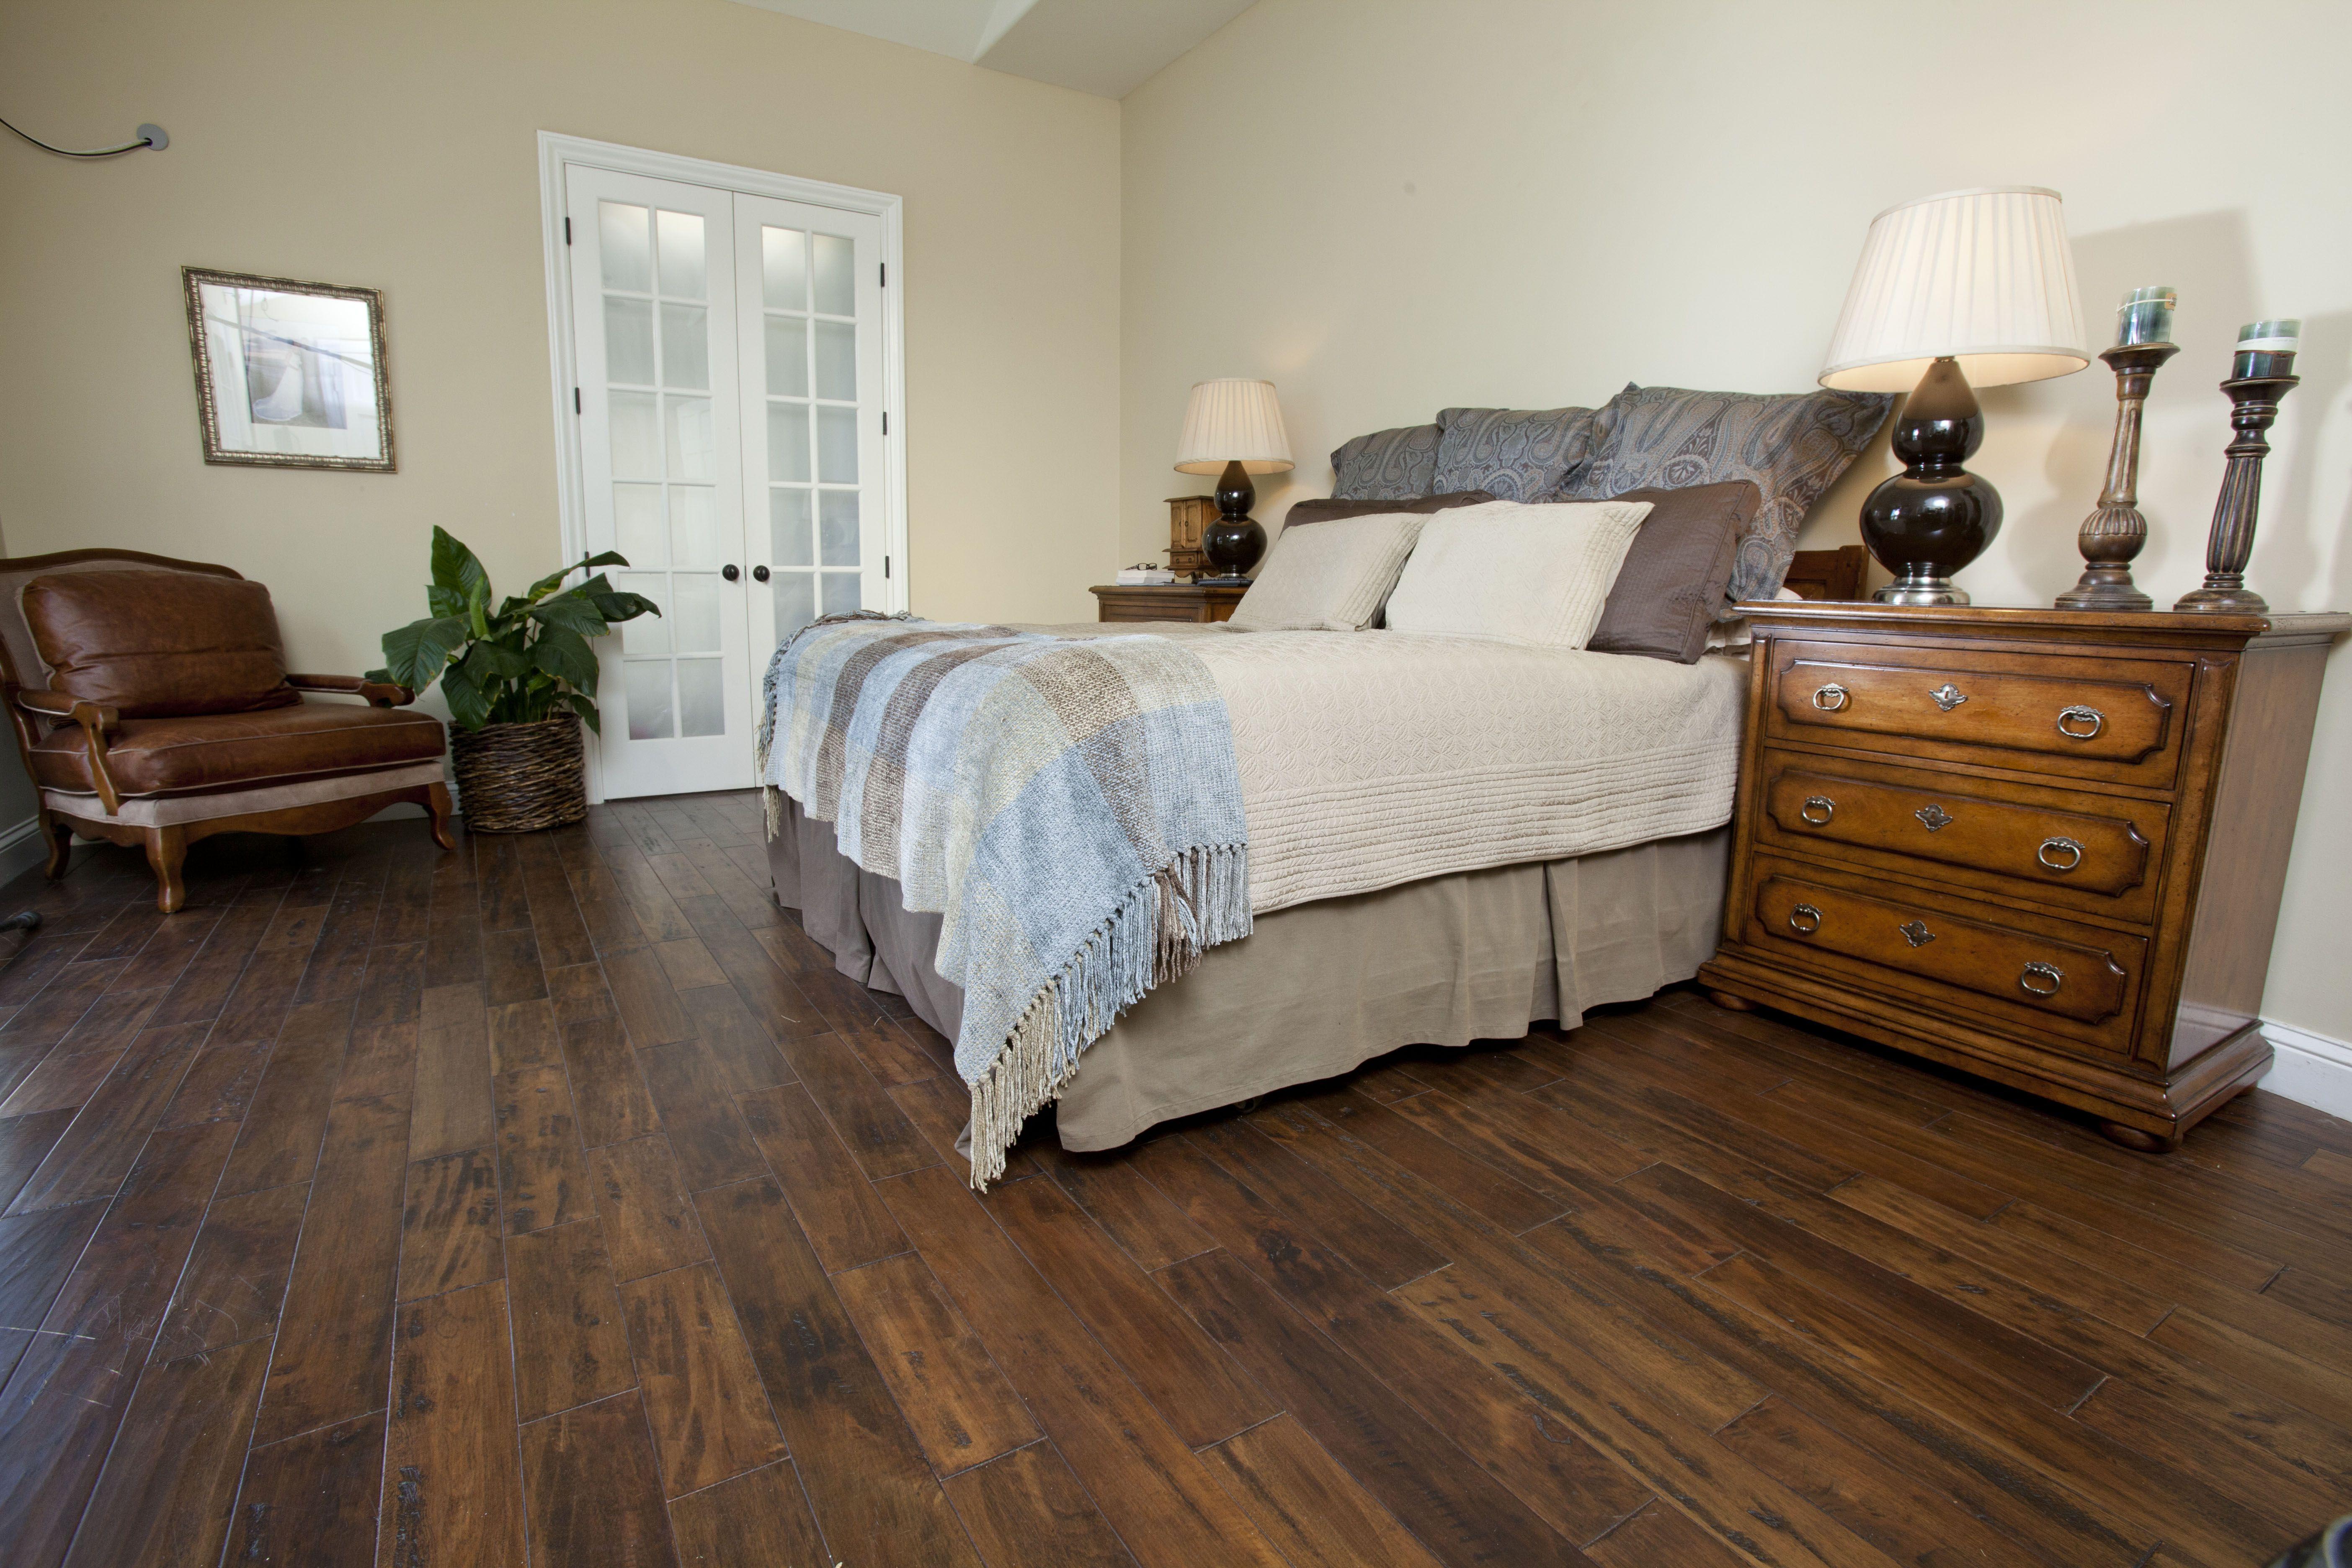 Hardwood is a nice compliment to this bedroom! Hardwood